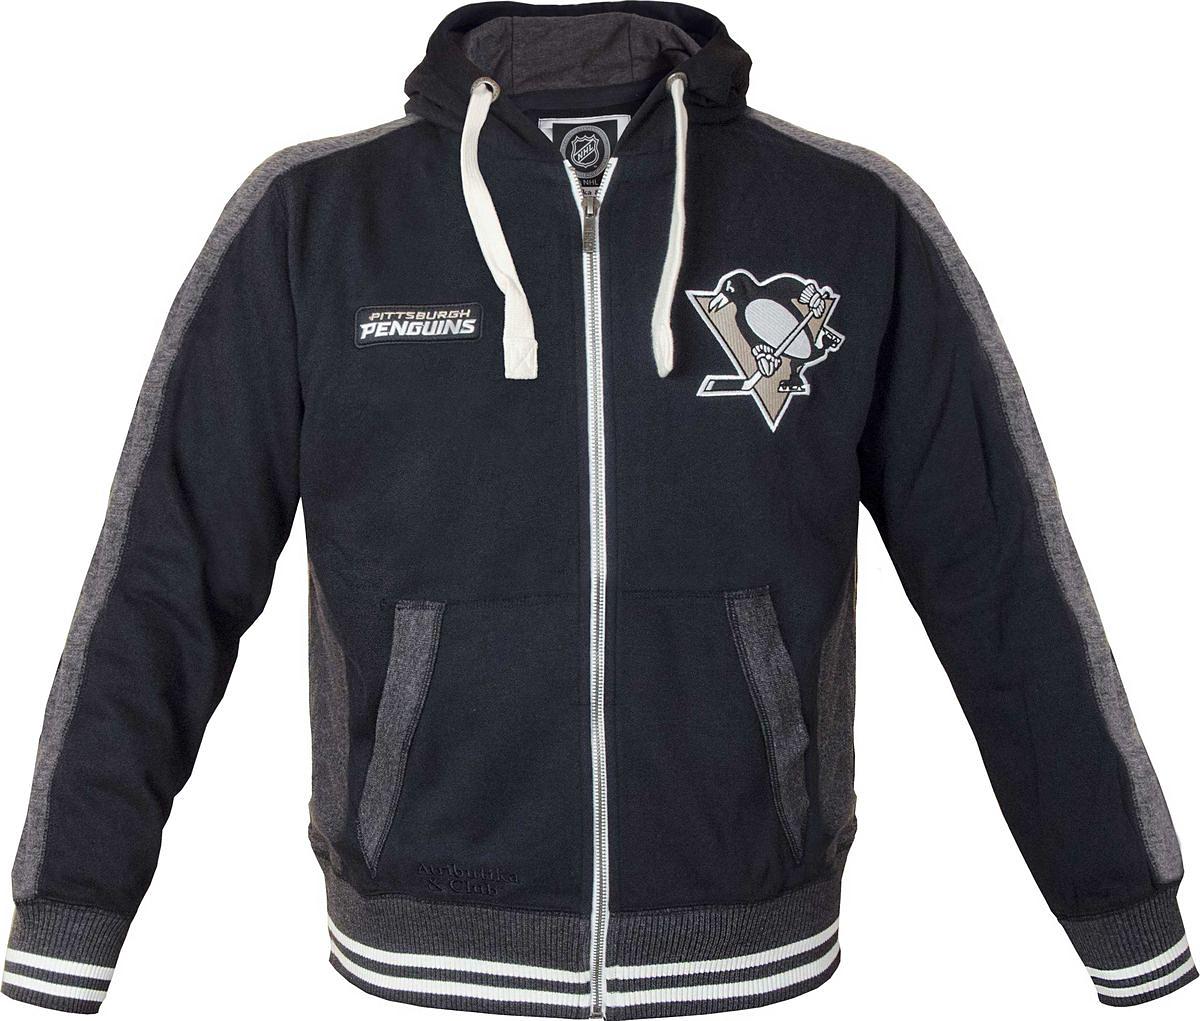 Толстовка мужская Atributika & Club Pittsburgh Penguins, цвет: черный. 35550. Размер S (46/48)35550